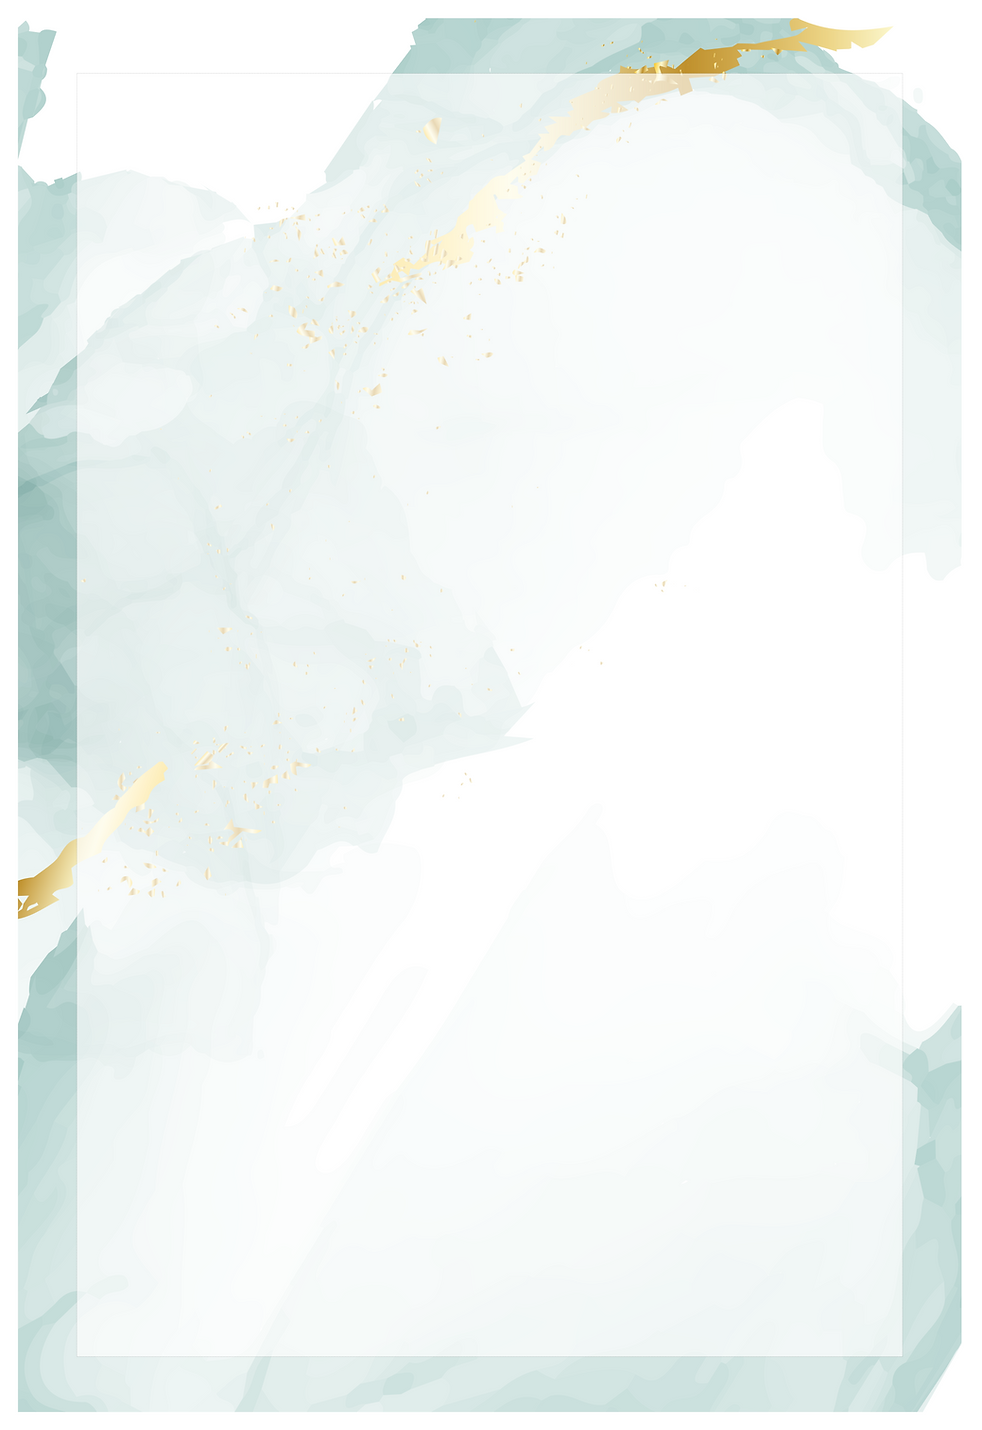 frame marco blanco fino watercolor.png